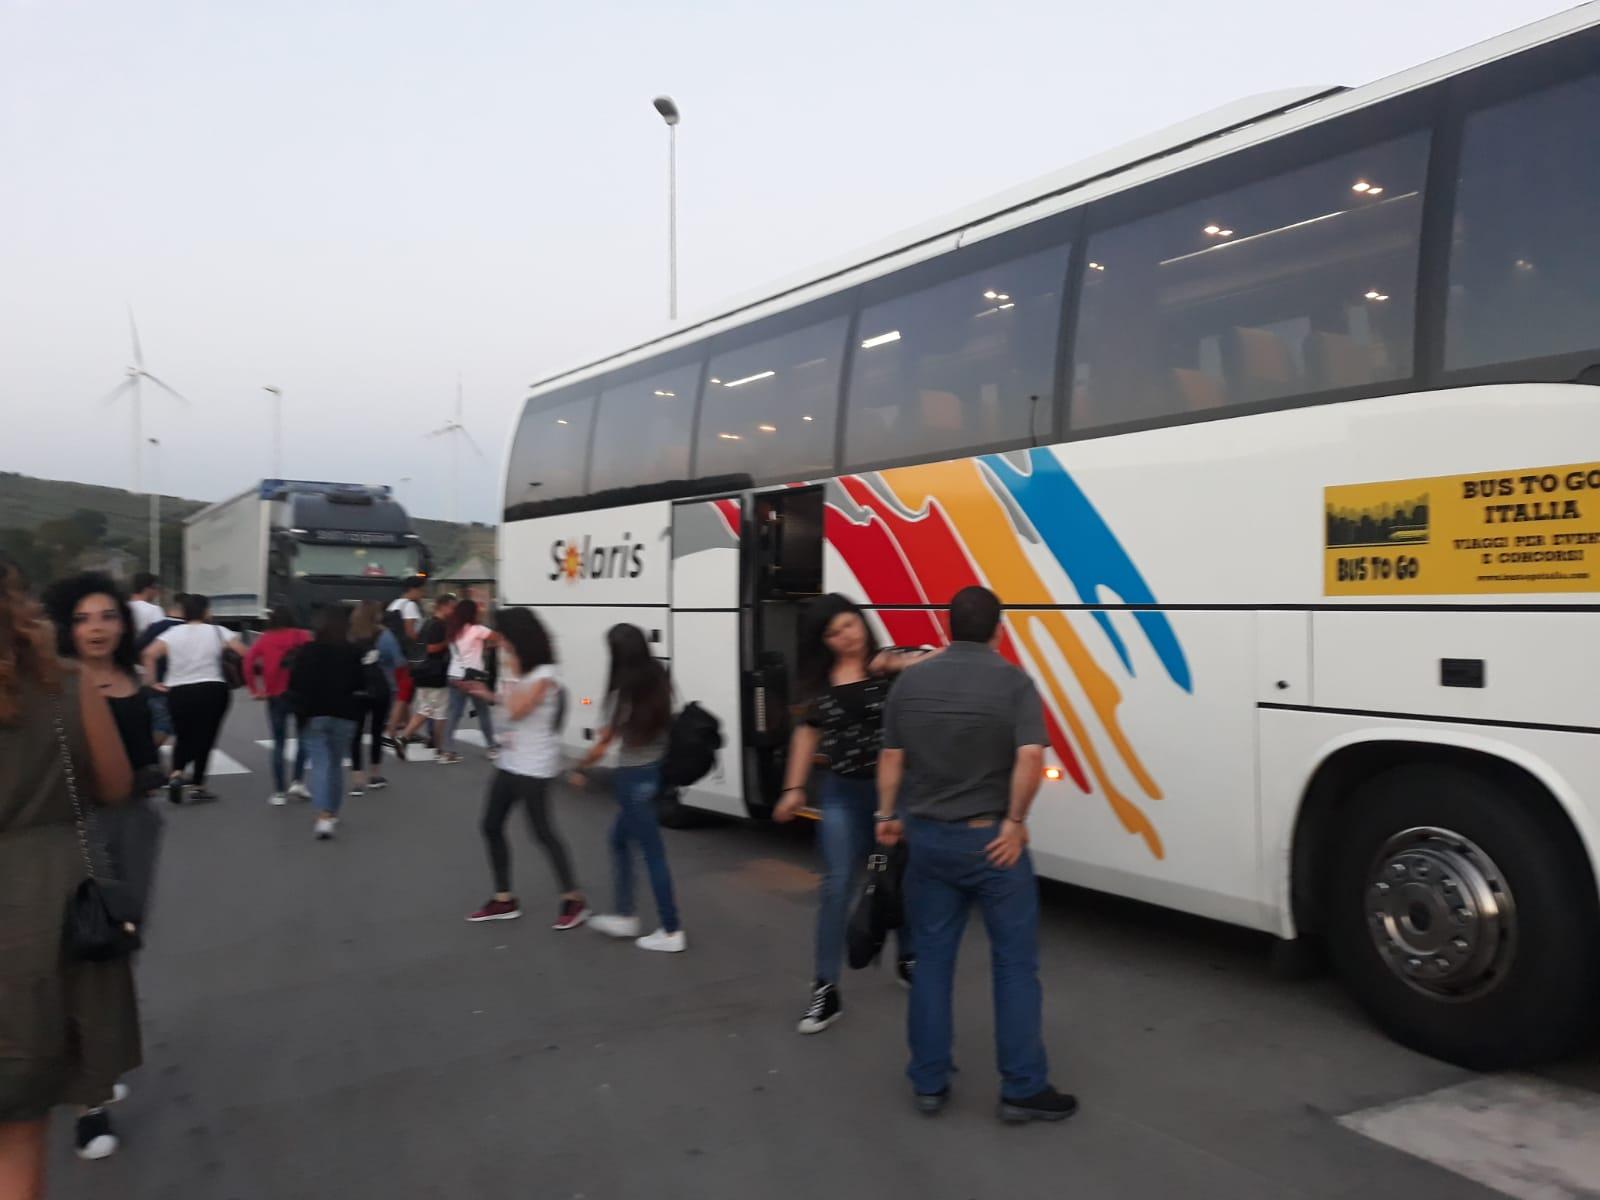 NOSTRI BUS 8